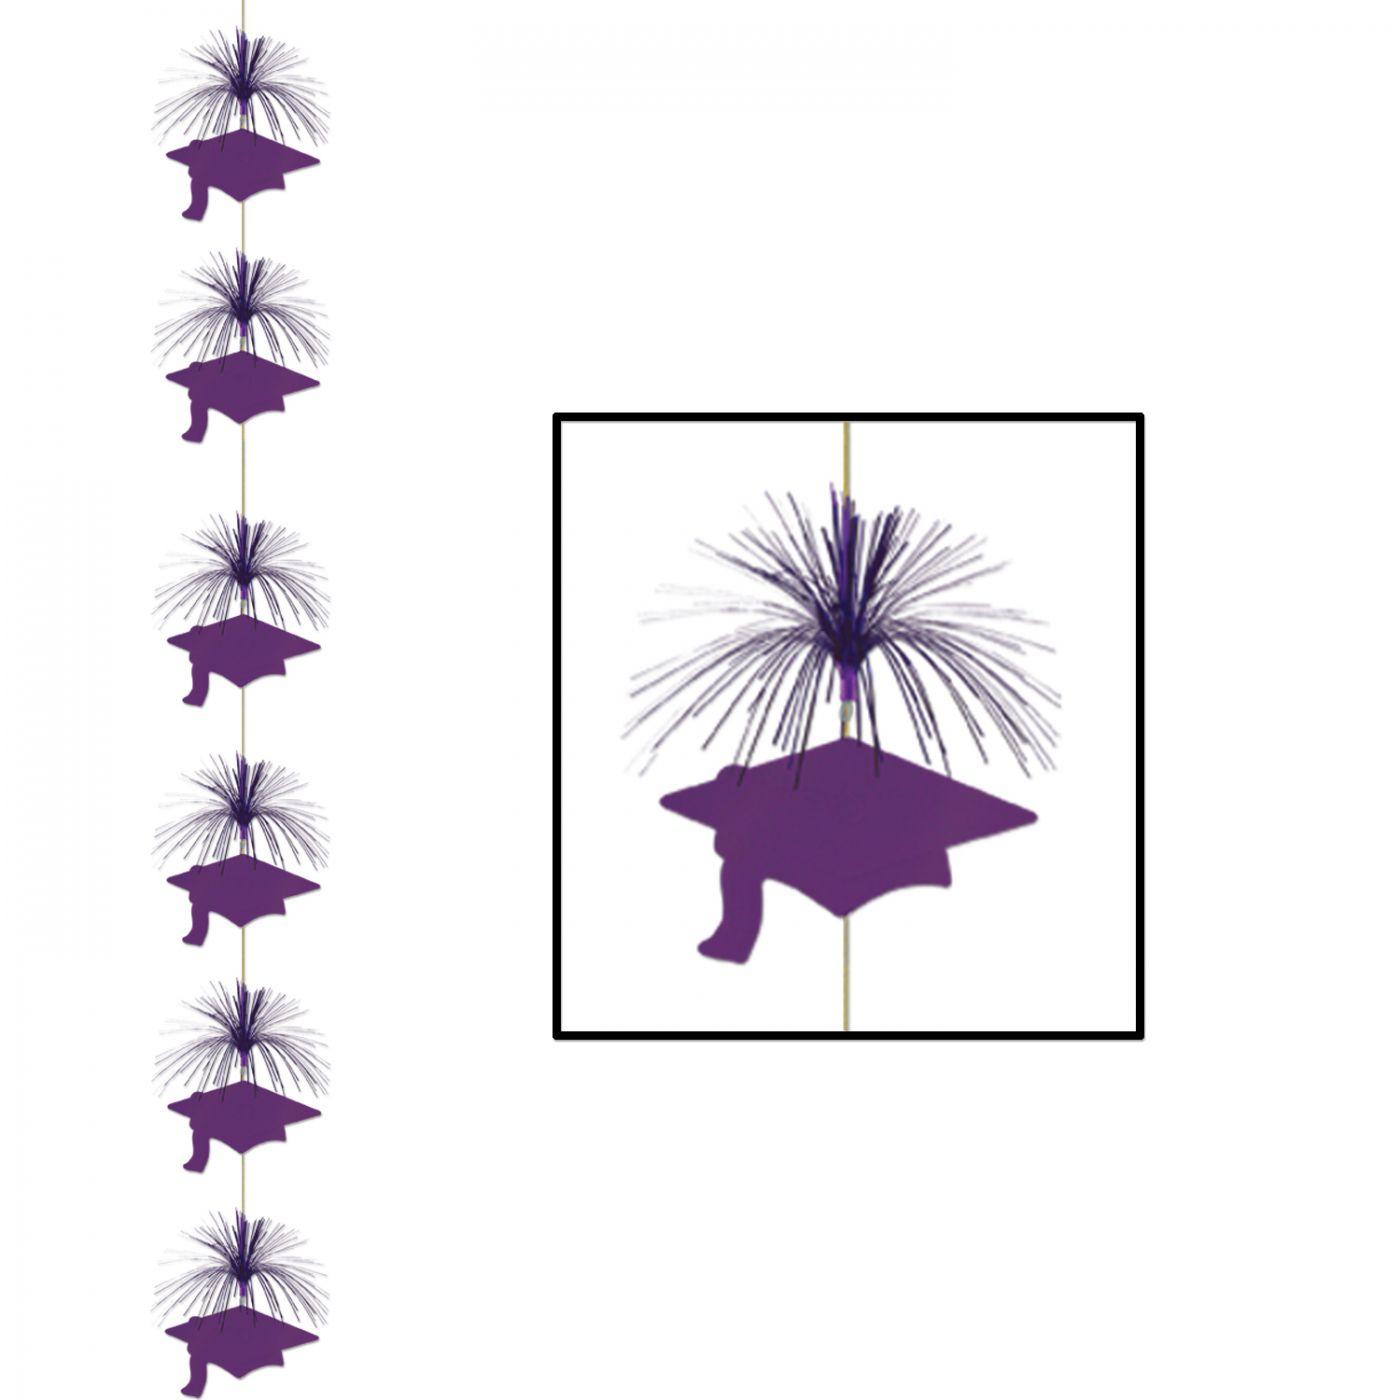 Grad Cap Firework Stringer image